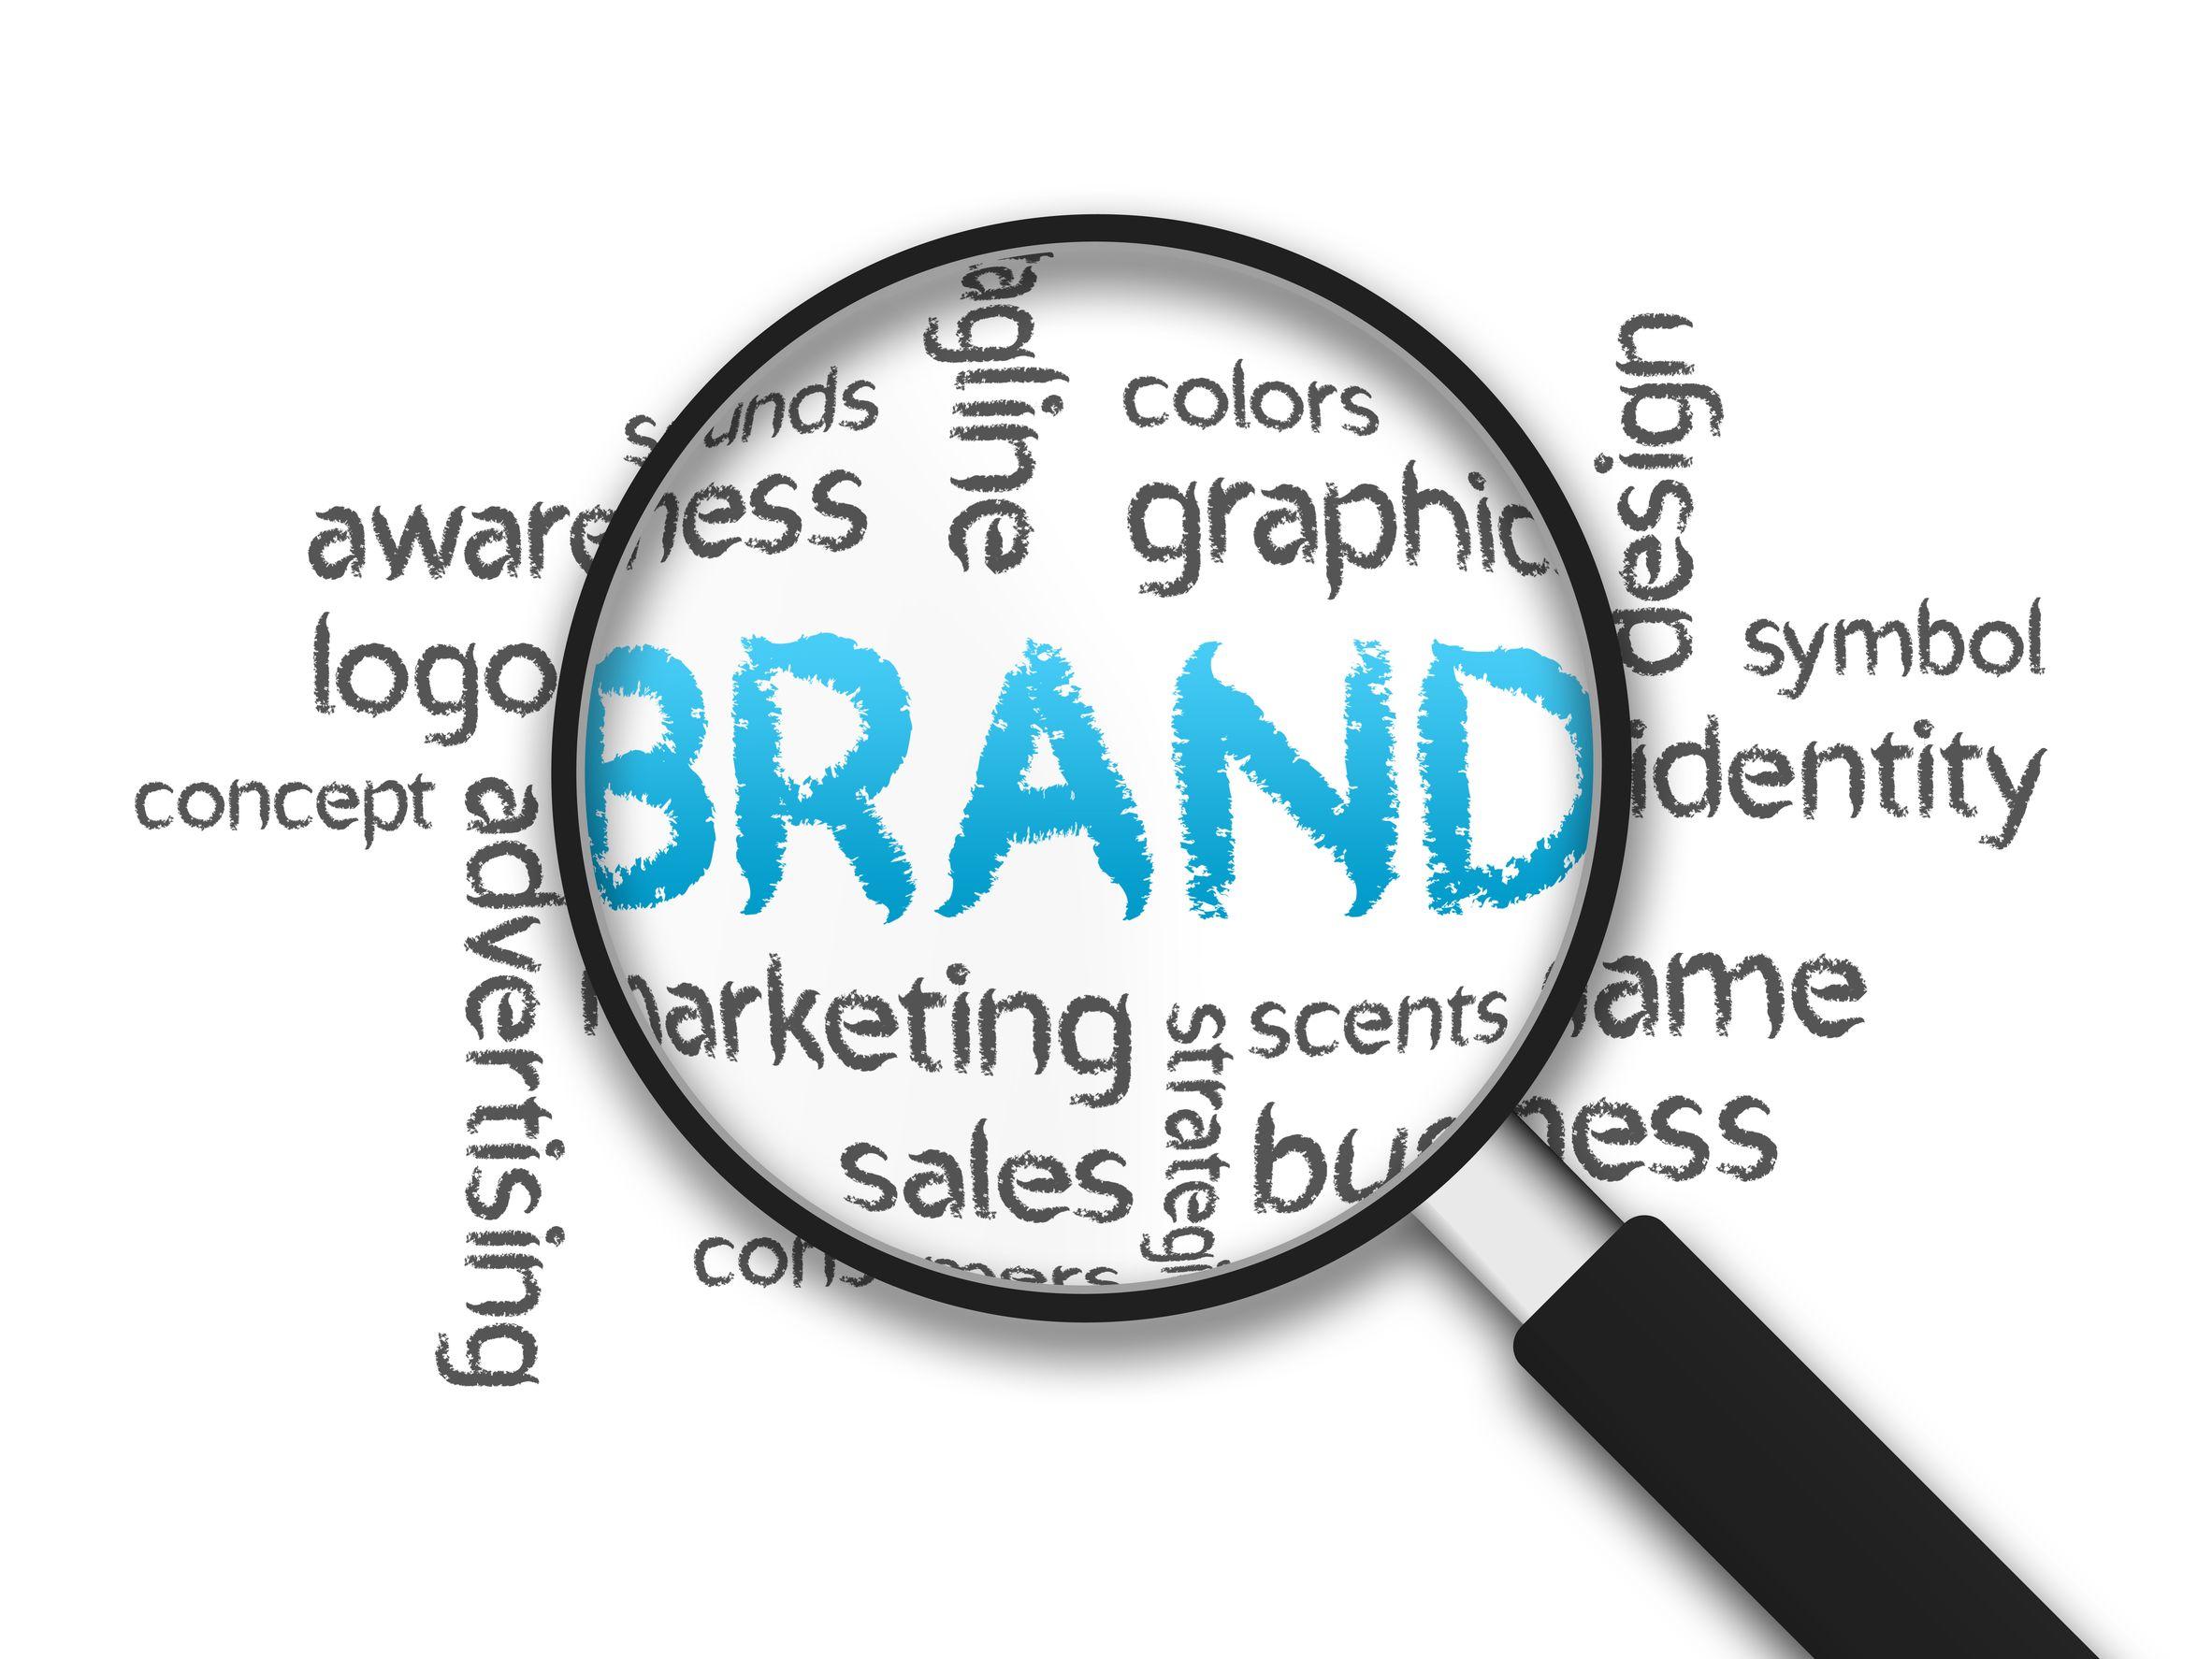 Branding concepts image